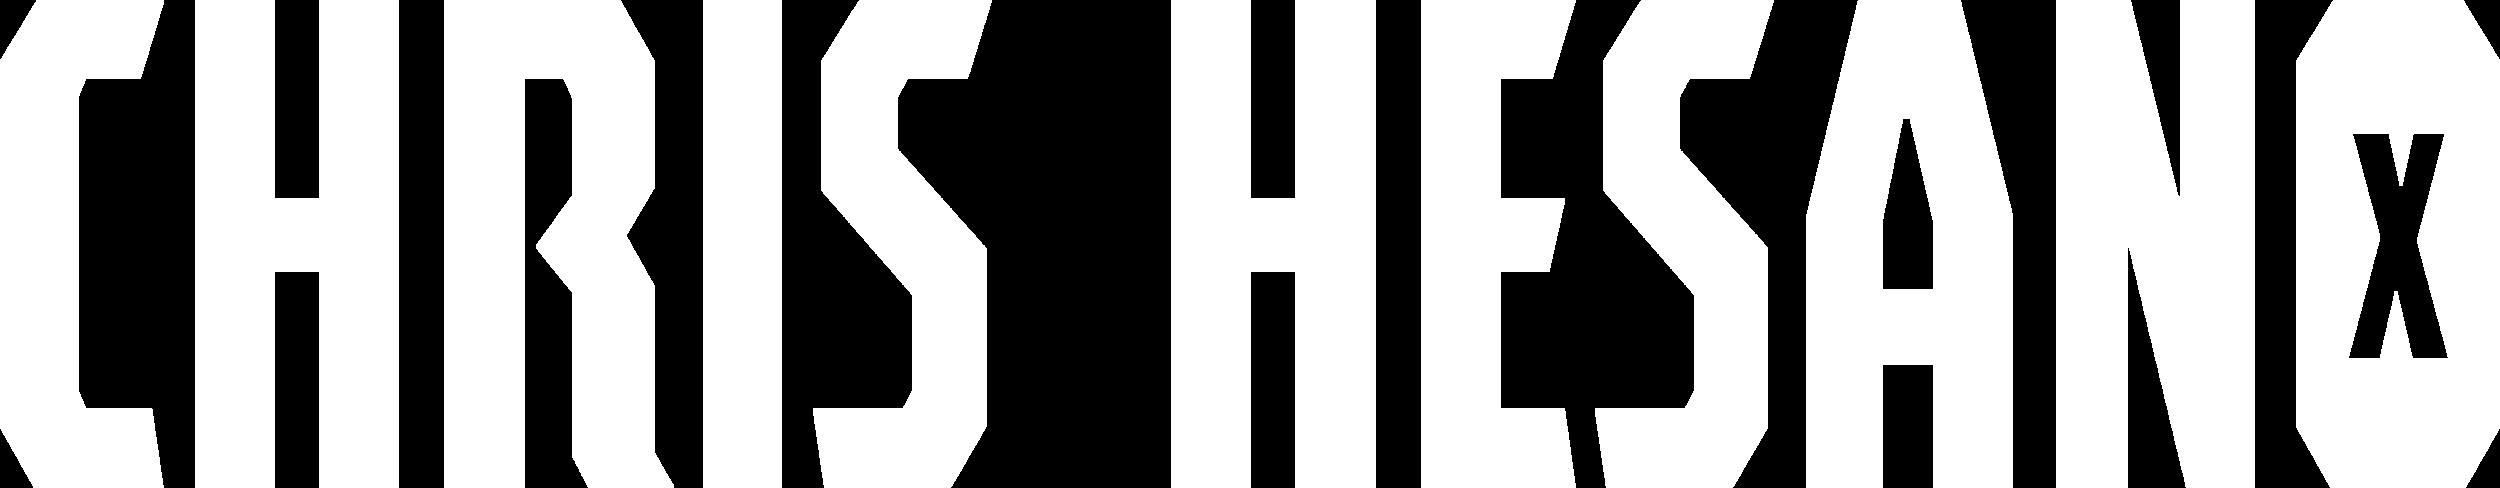 Chris-Hesano-Logo.png